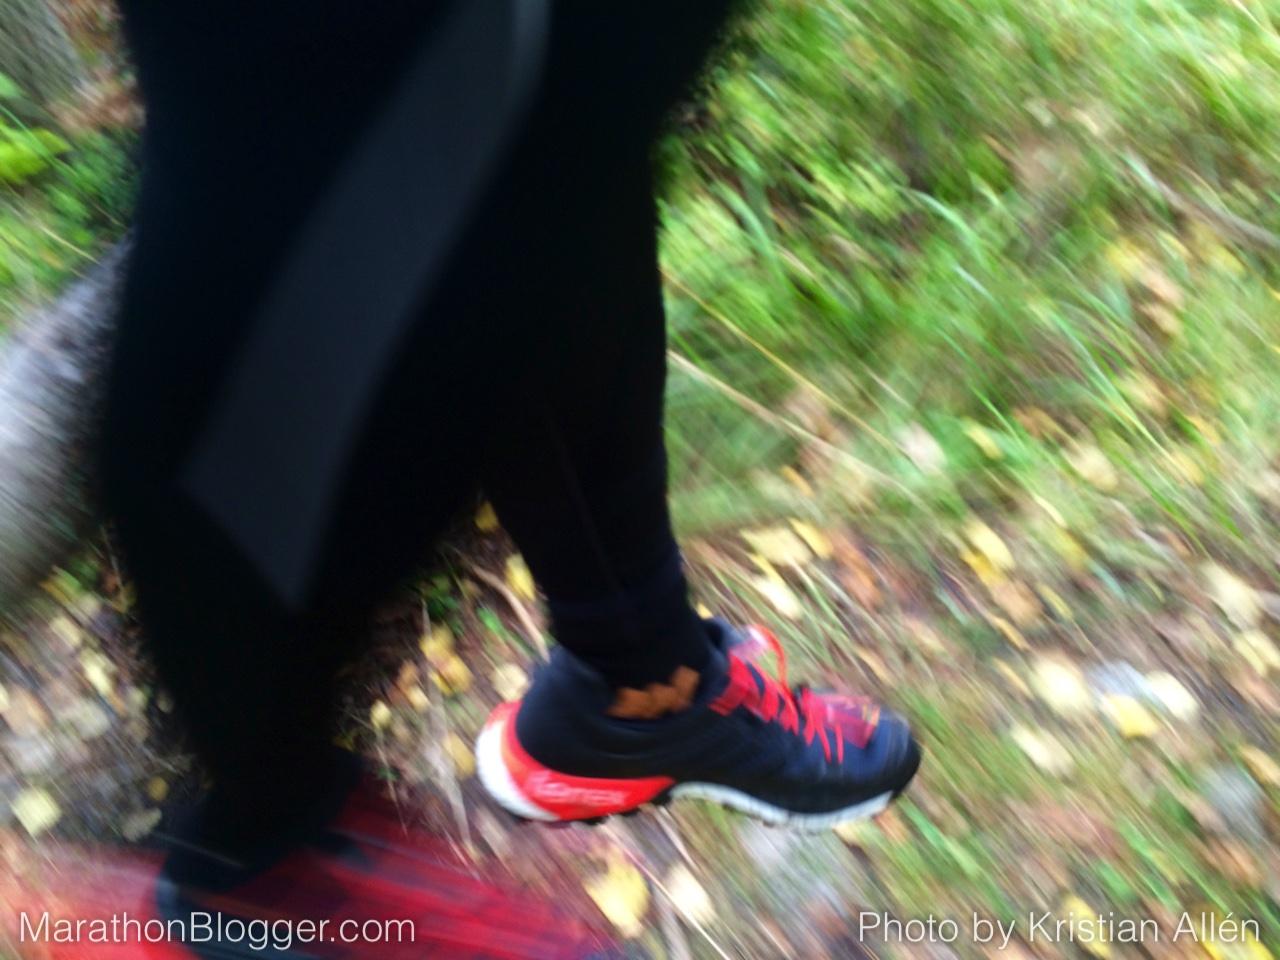 27.9.2015 9.56 km Run